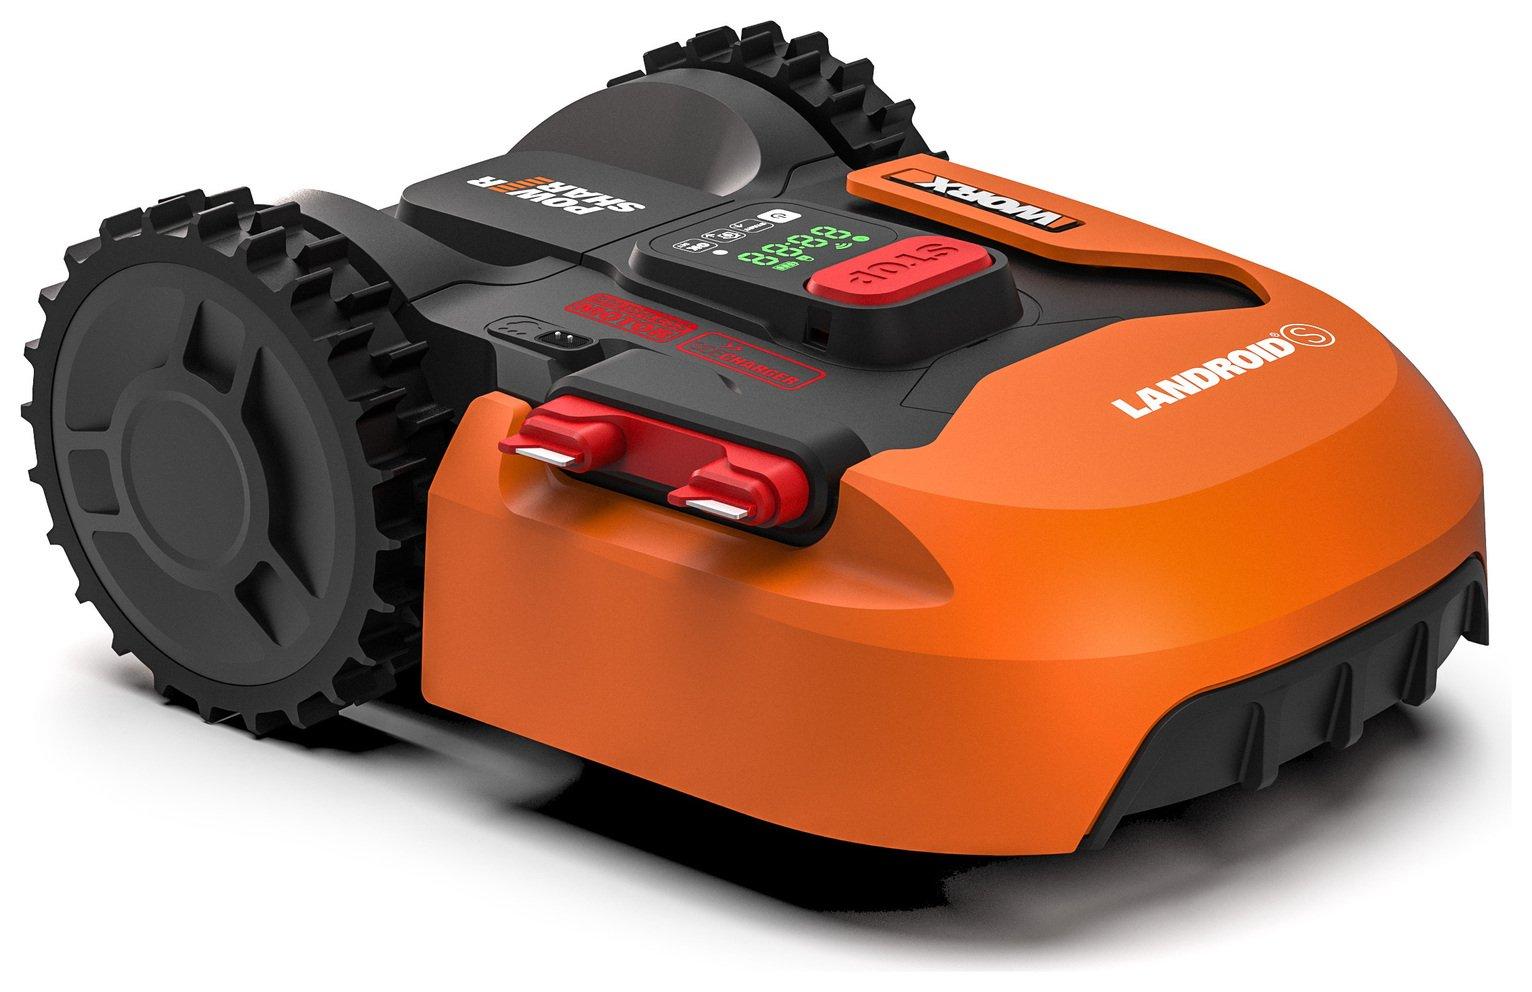 Image Of Worx Wr130 300 M2 Landroid Robotic Lawnmower